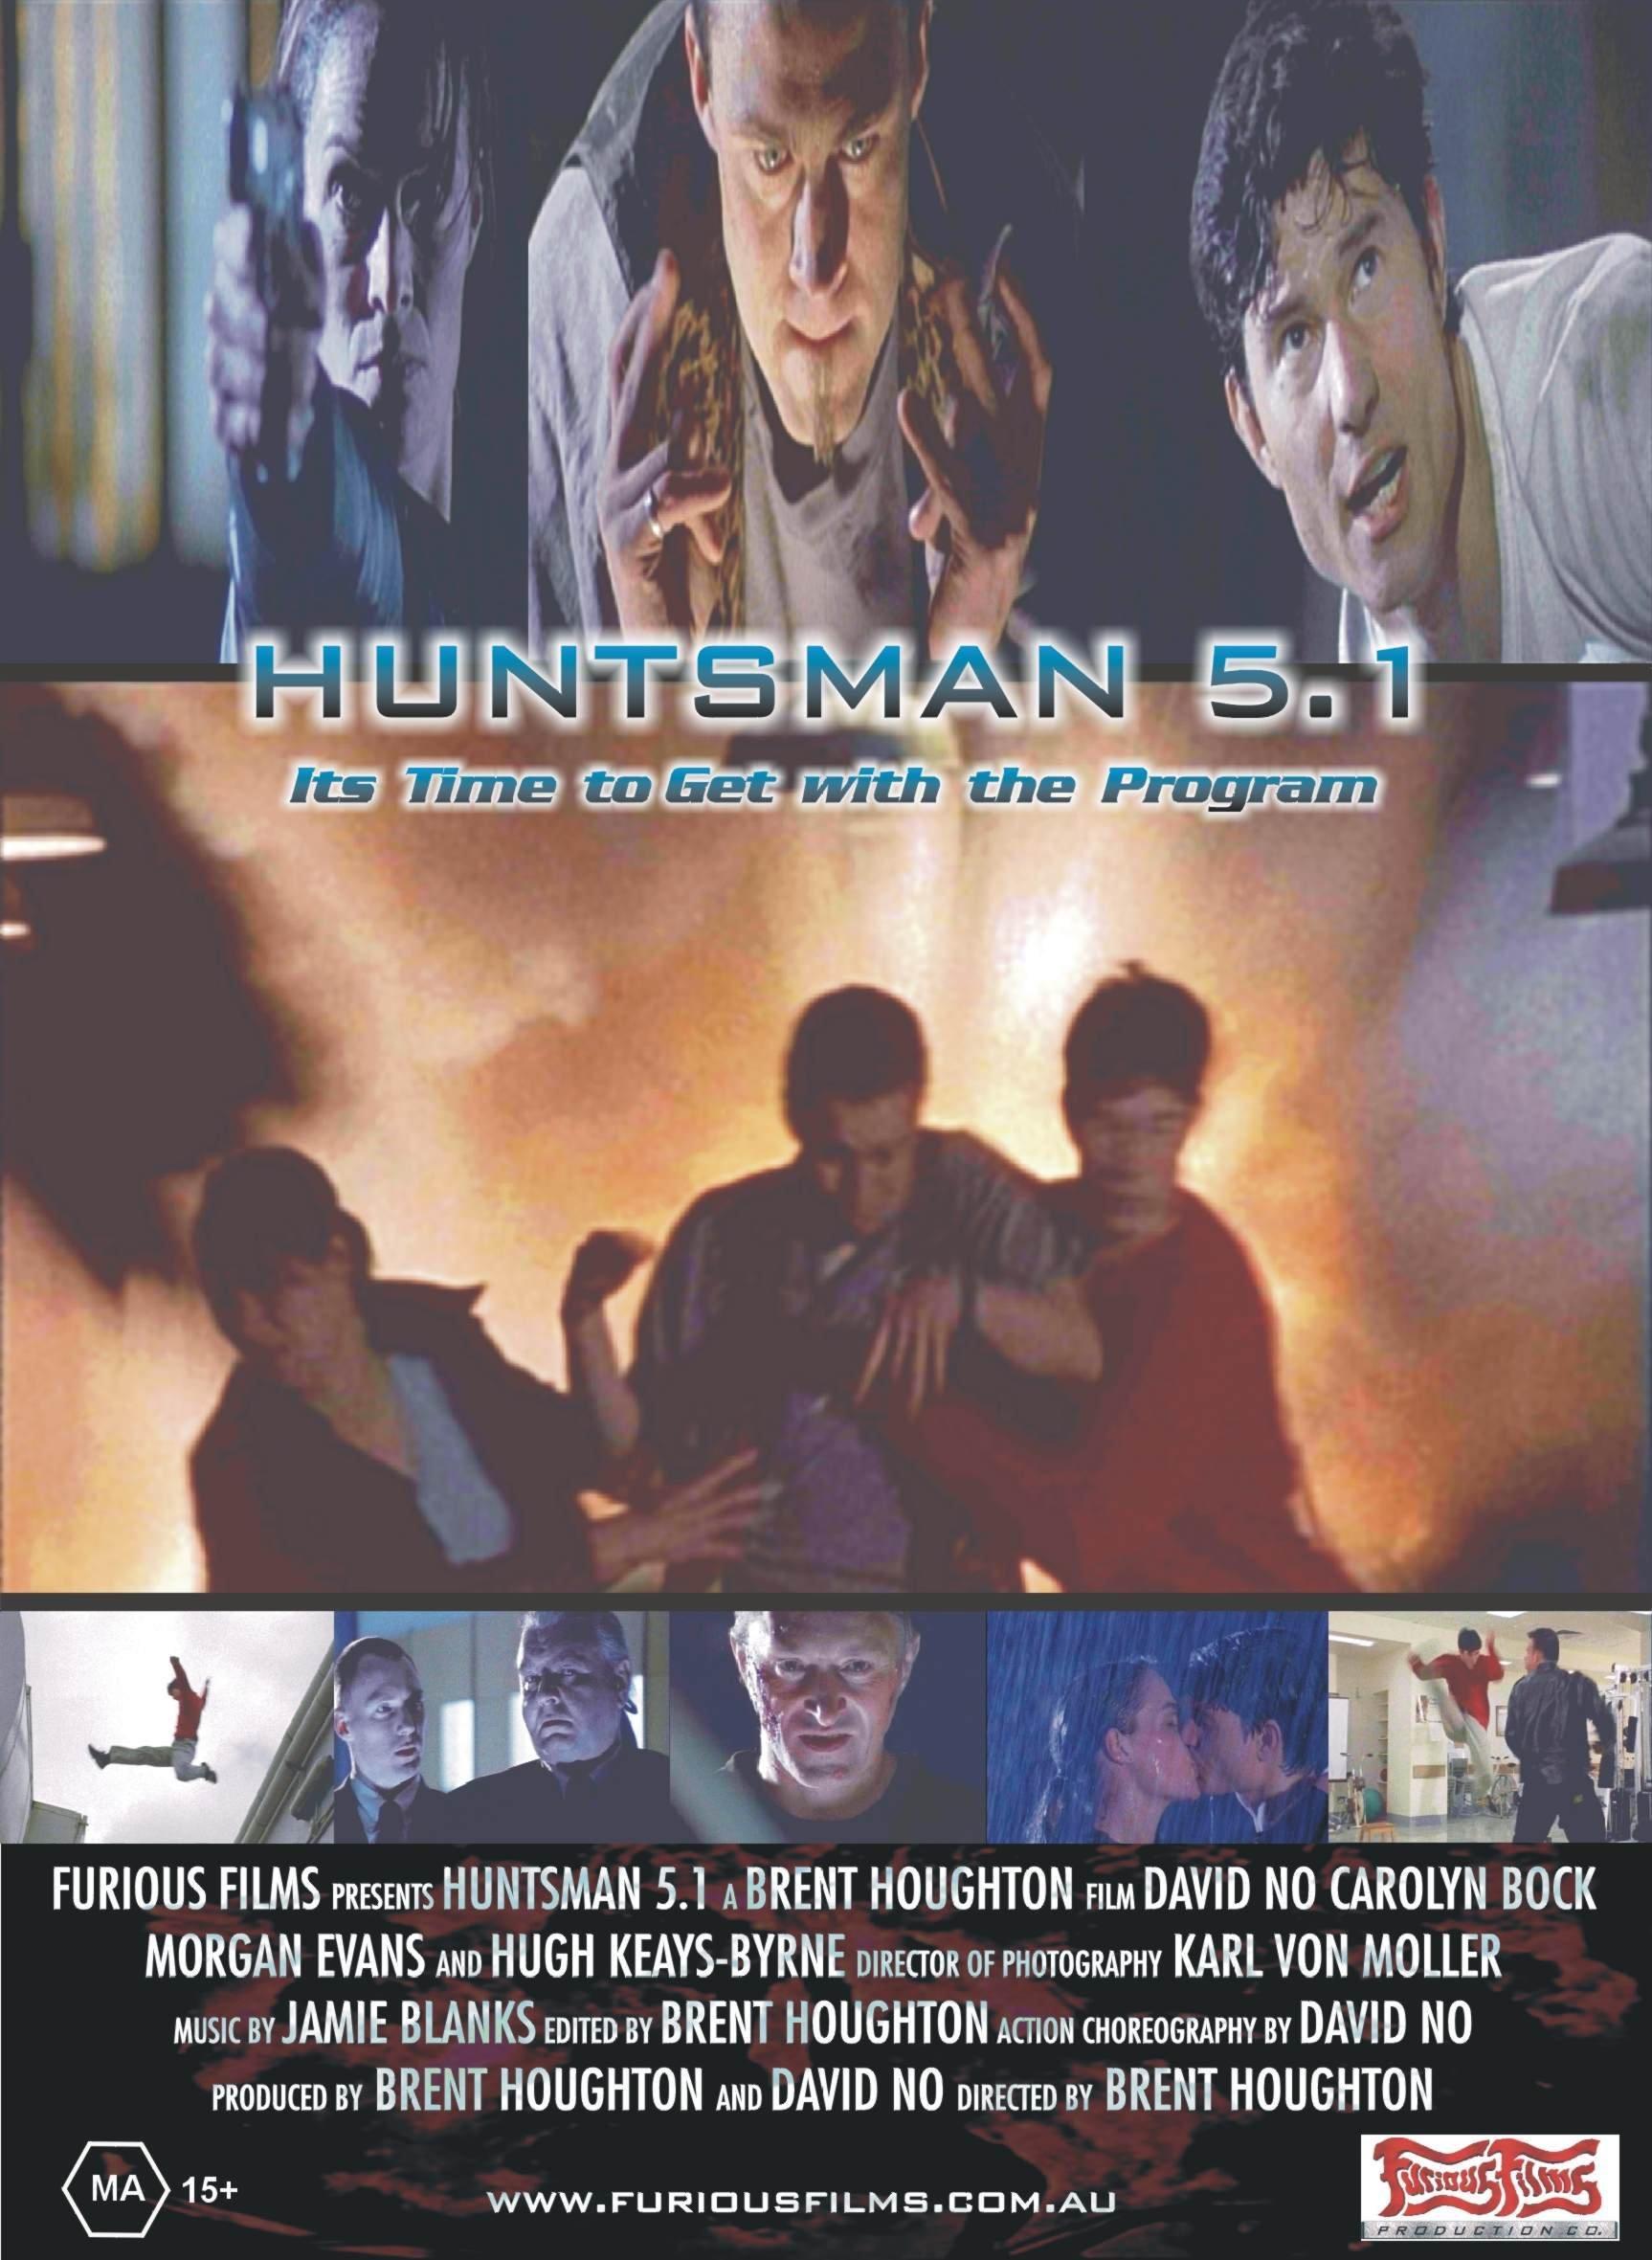 Huntsman 5.1